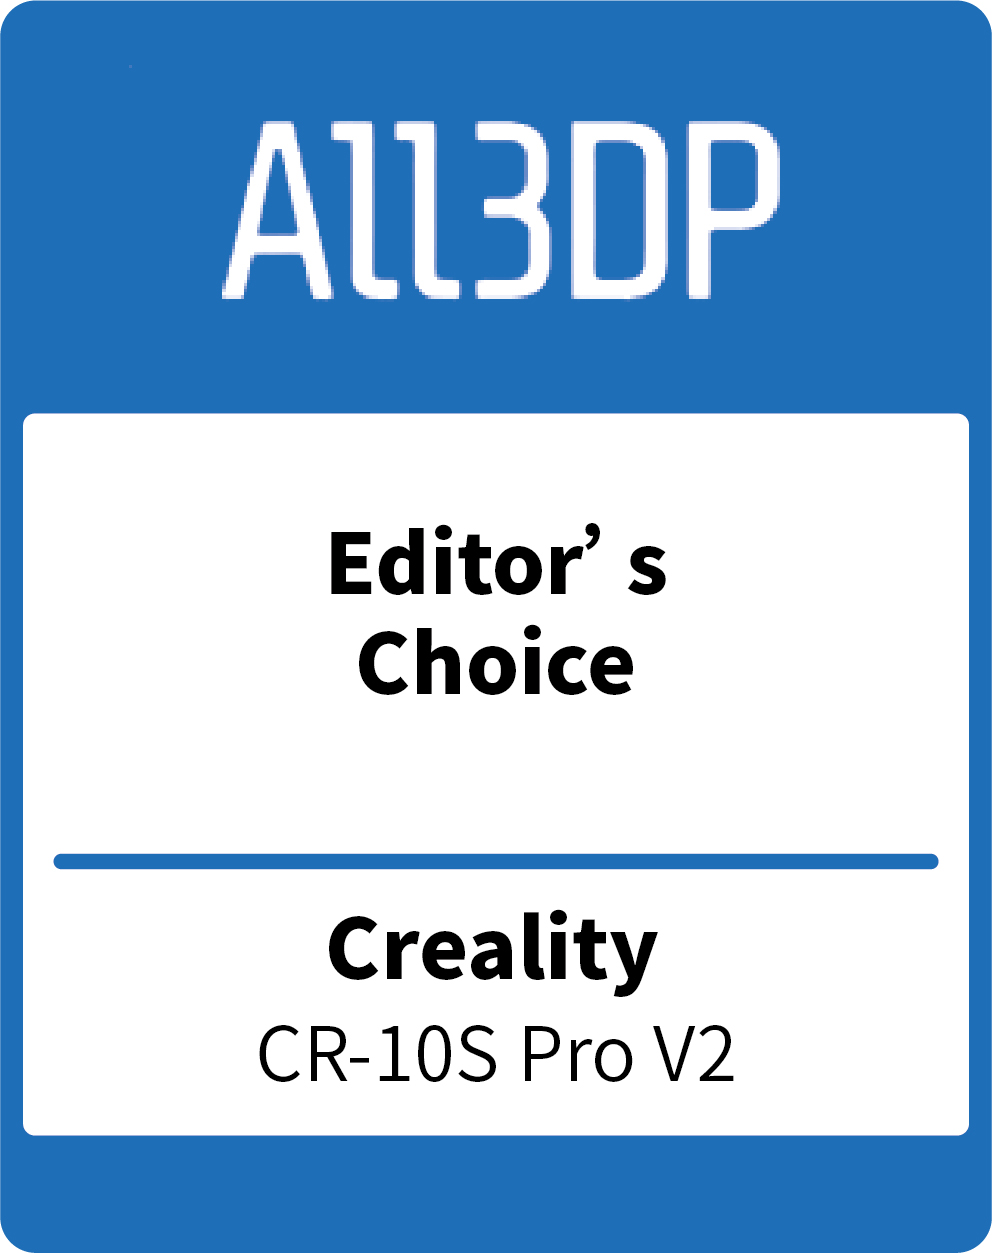 CR-10S Pro V2